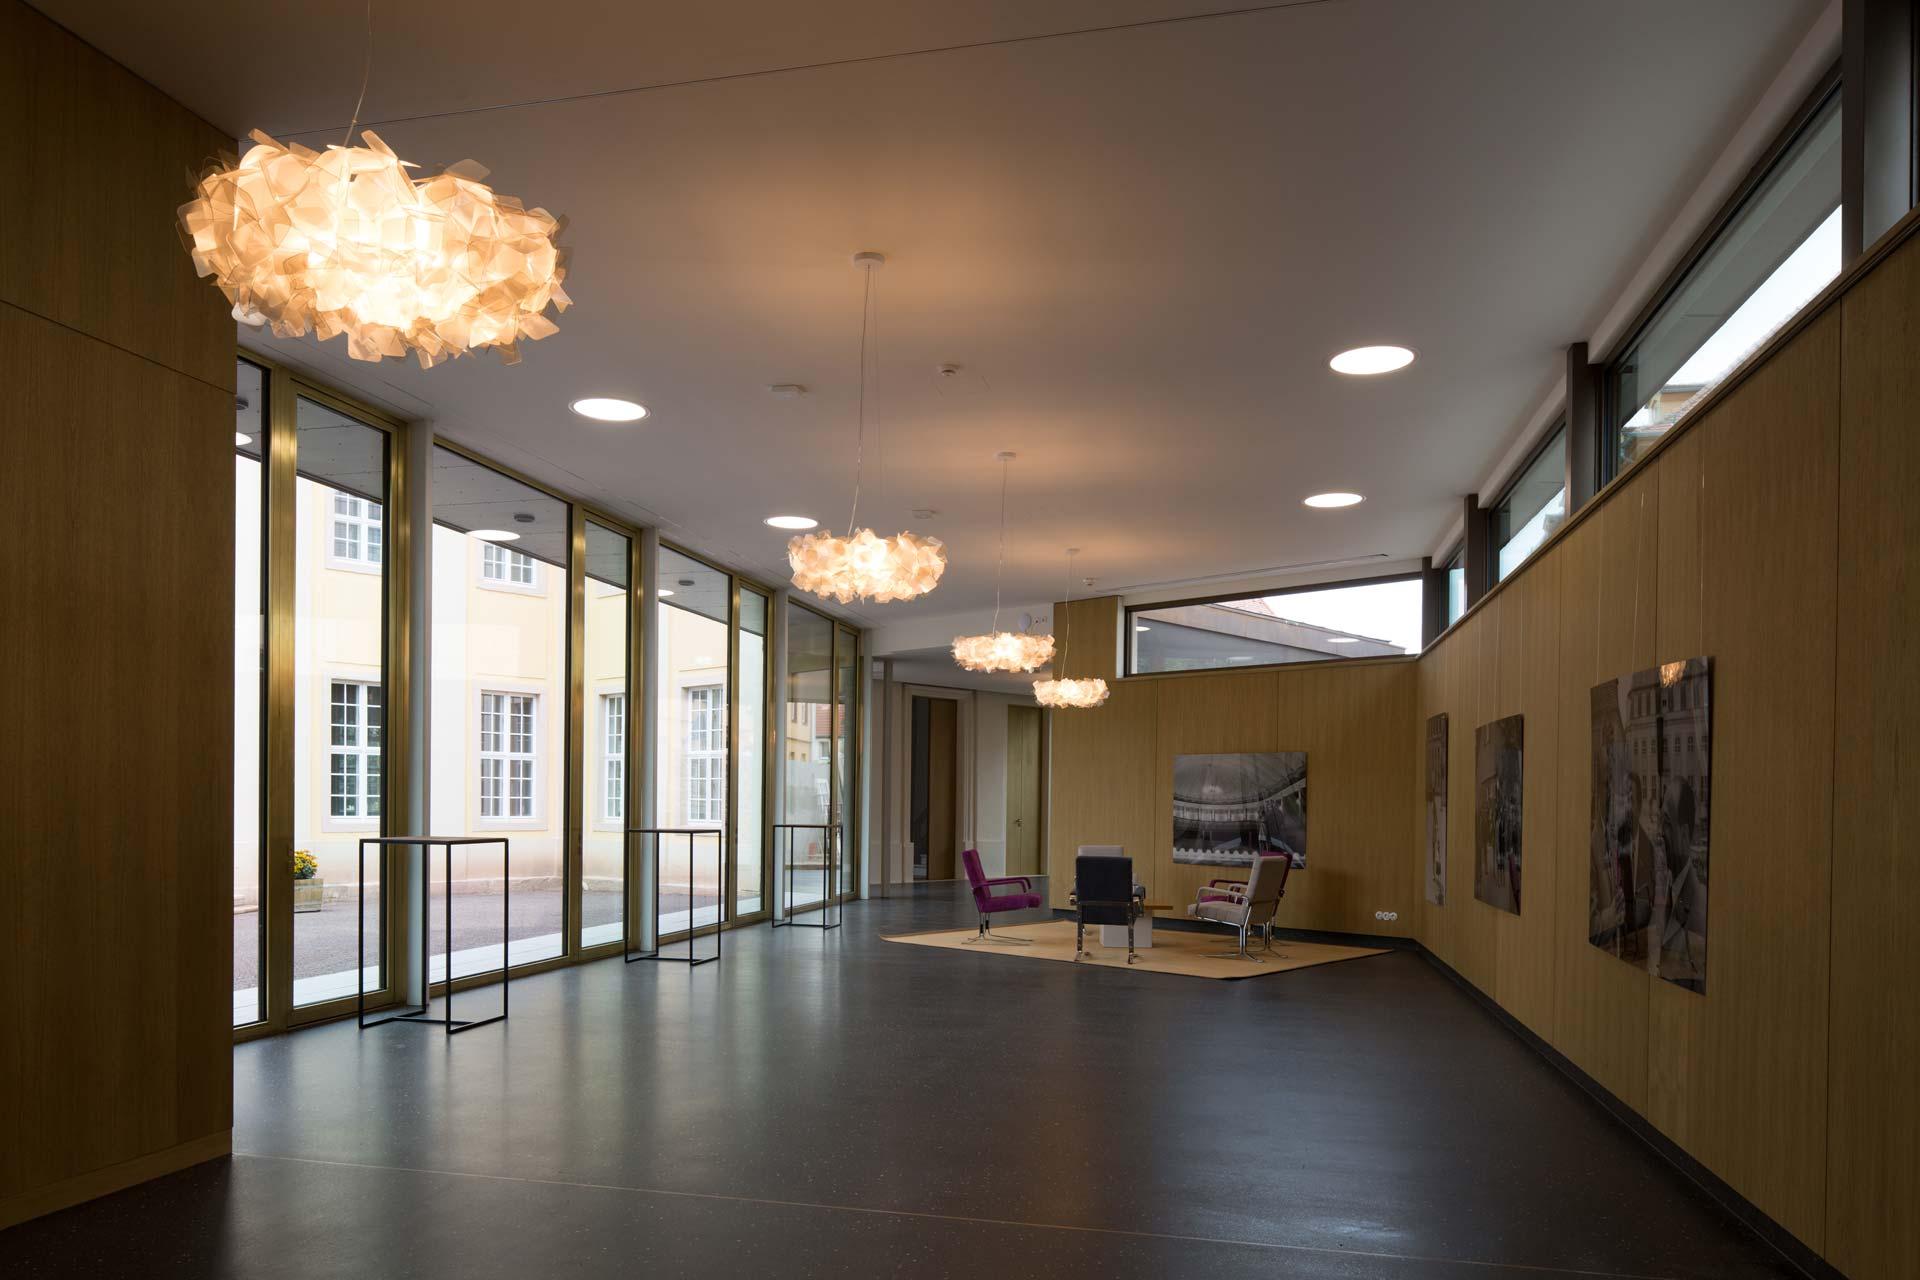 Genscher Saal – Historische Kuranlagen & Goethe-Theater Bad Lauchstädt GmbH